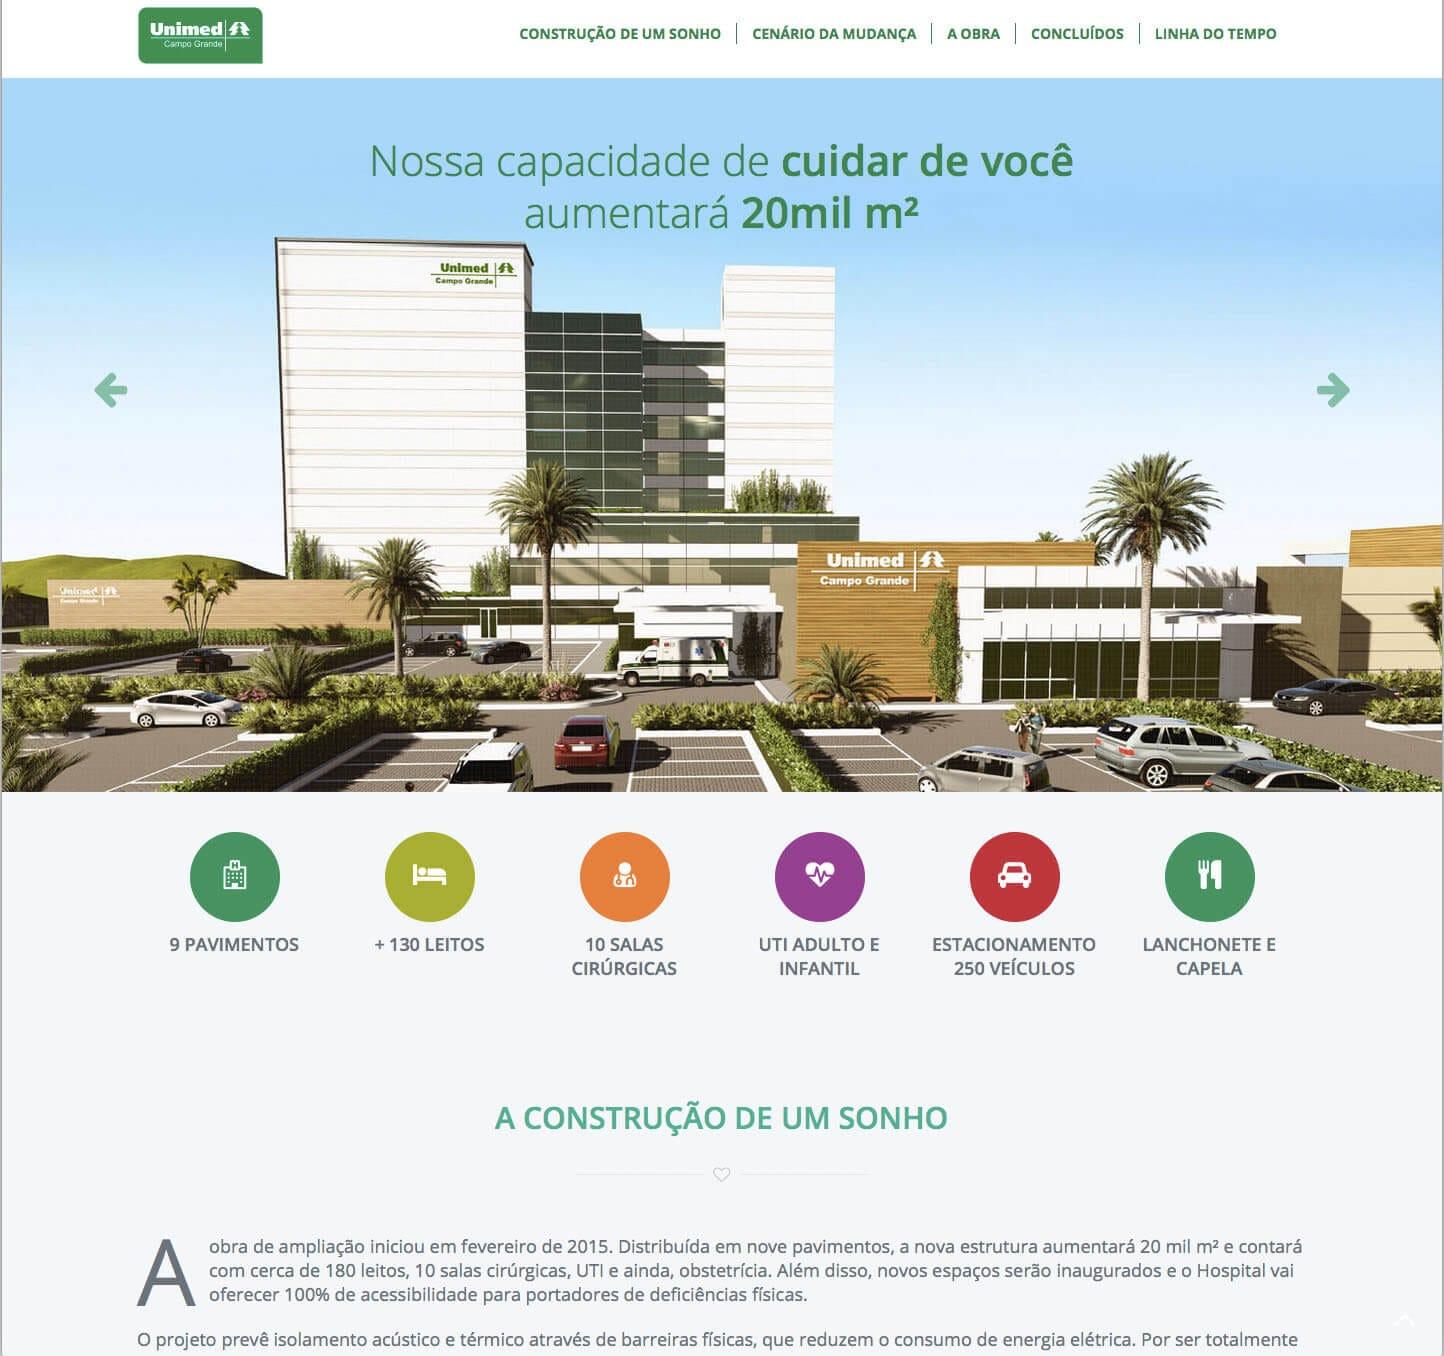 hotsite_ampliacao_hospital_unimed_cg